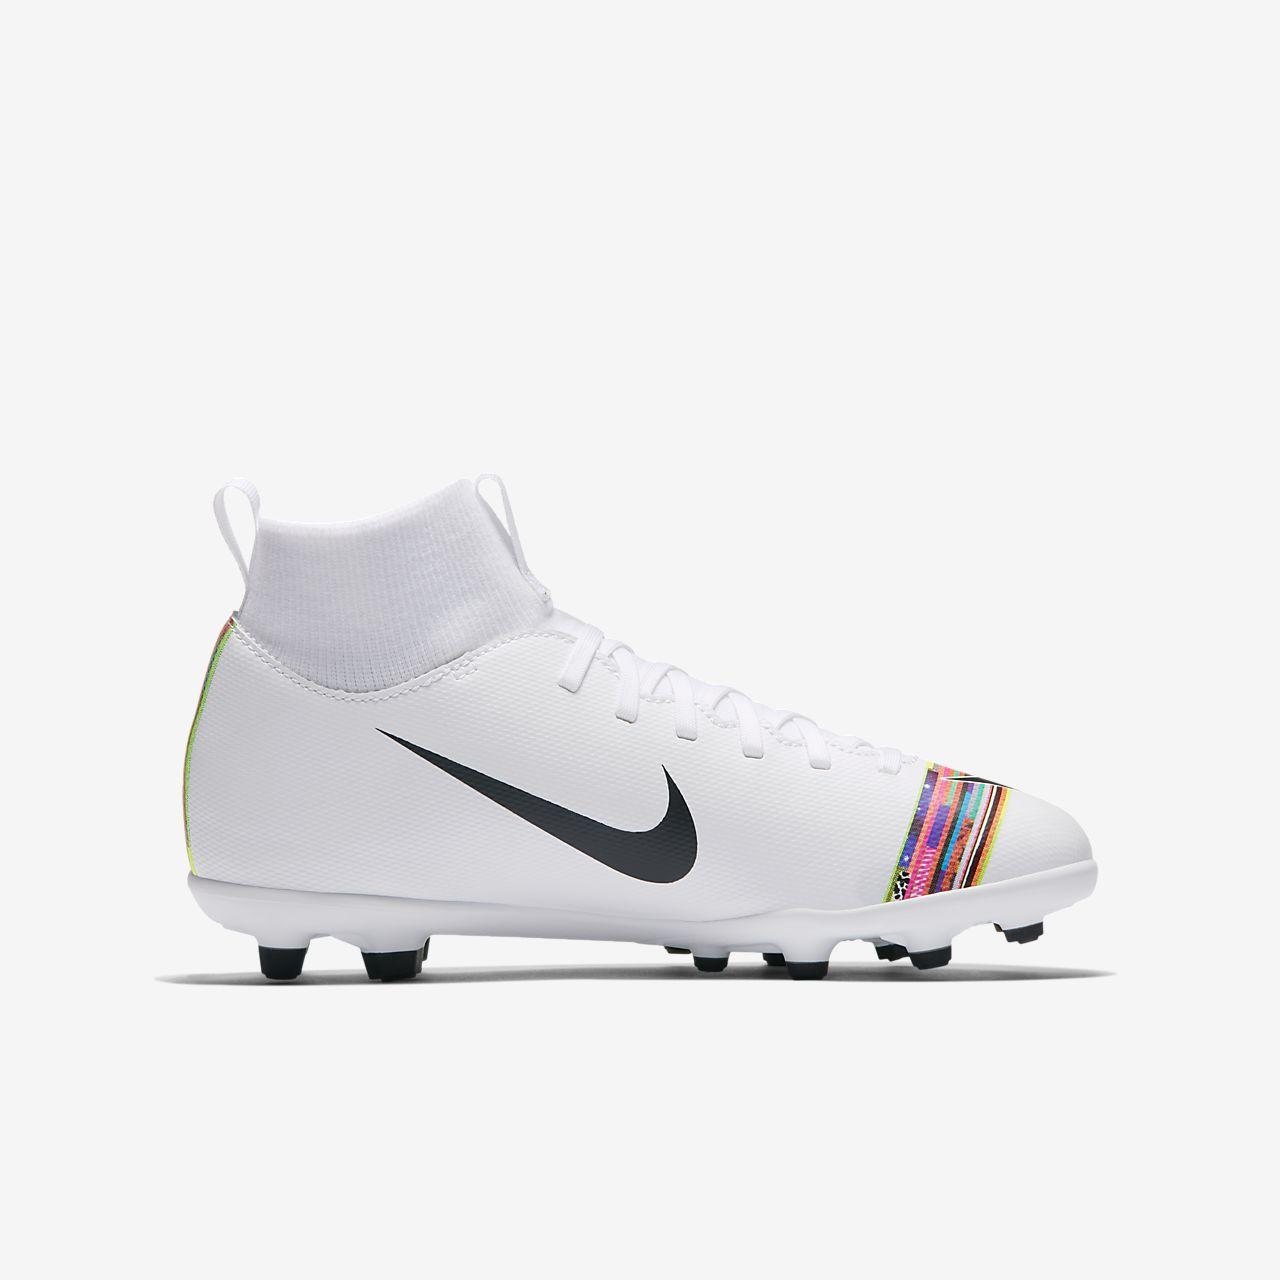 599197af78ea ... Nike Jr. Superfly 6 Club MG Younger/Older Kids' Multi-Ground Football